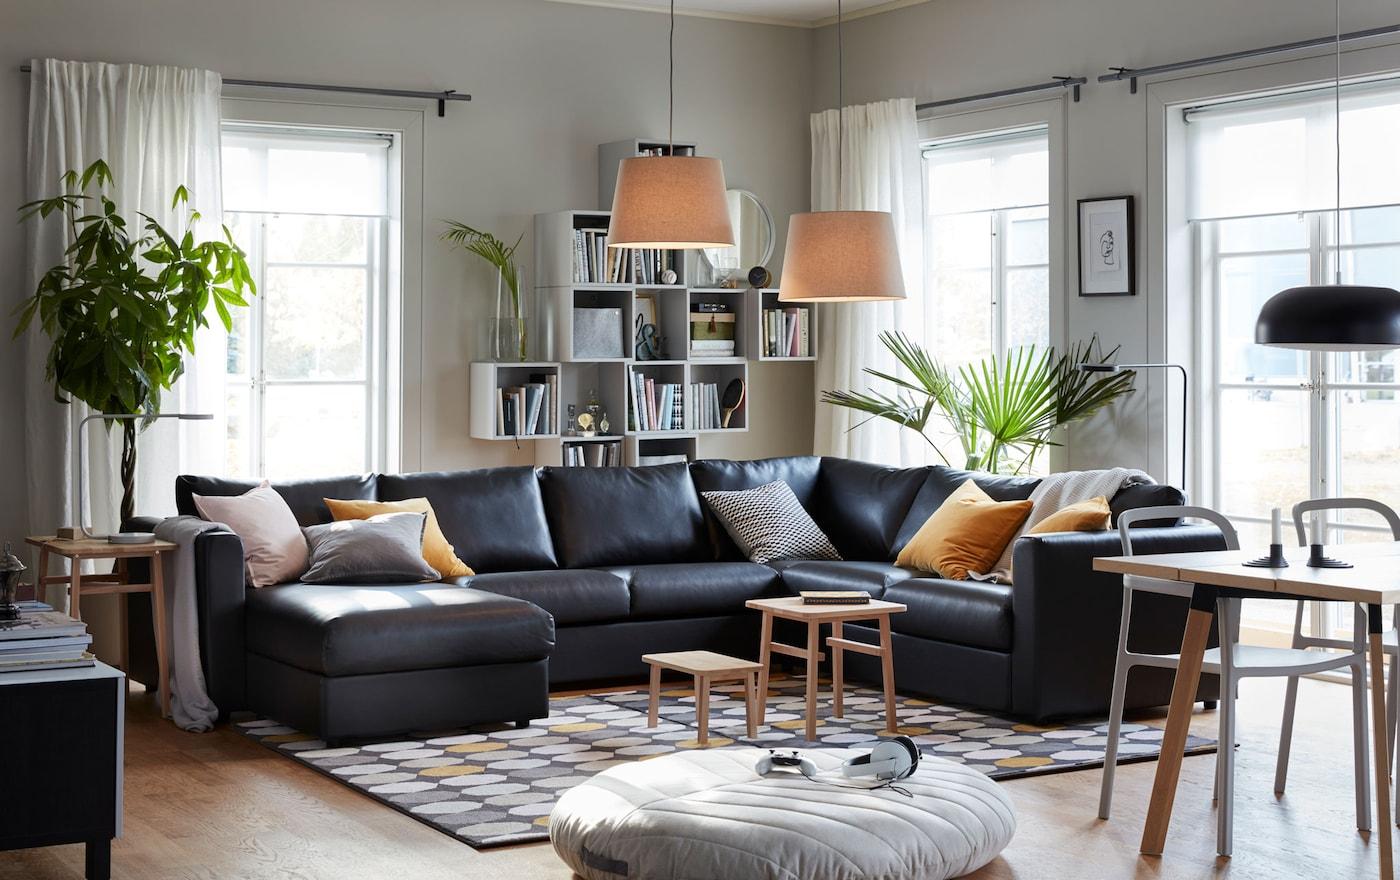 Zwart Leren Bankstel Design.Living Room Ideas Home Furnishing Ikea Ikea